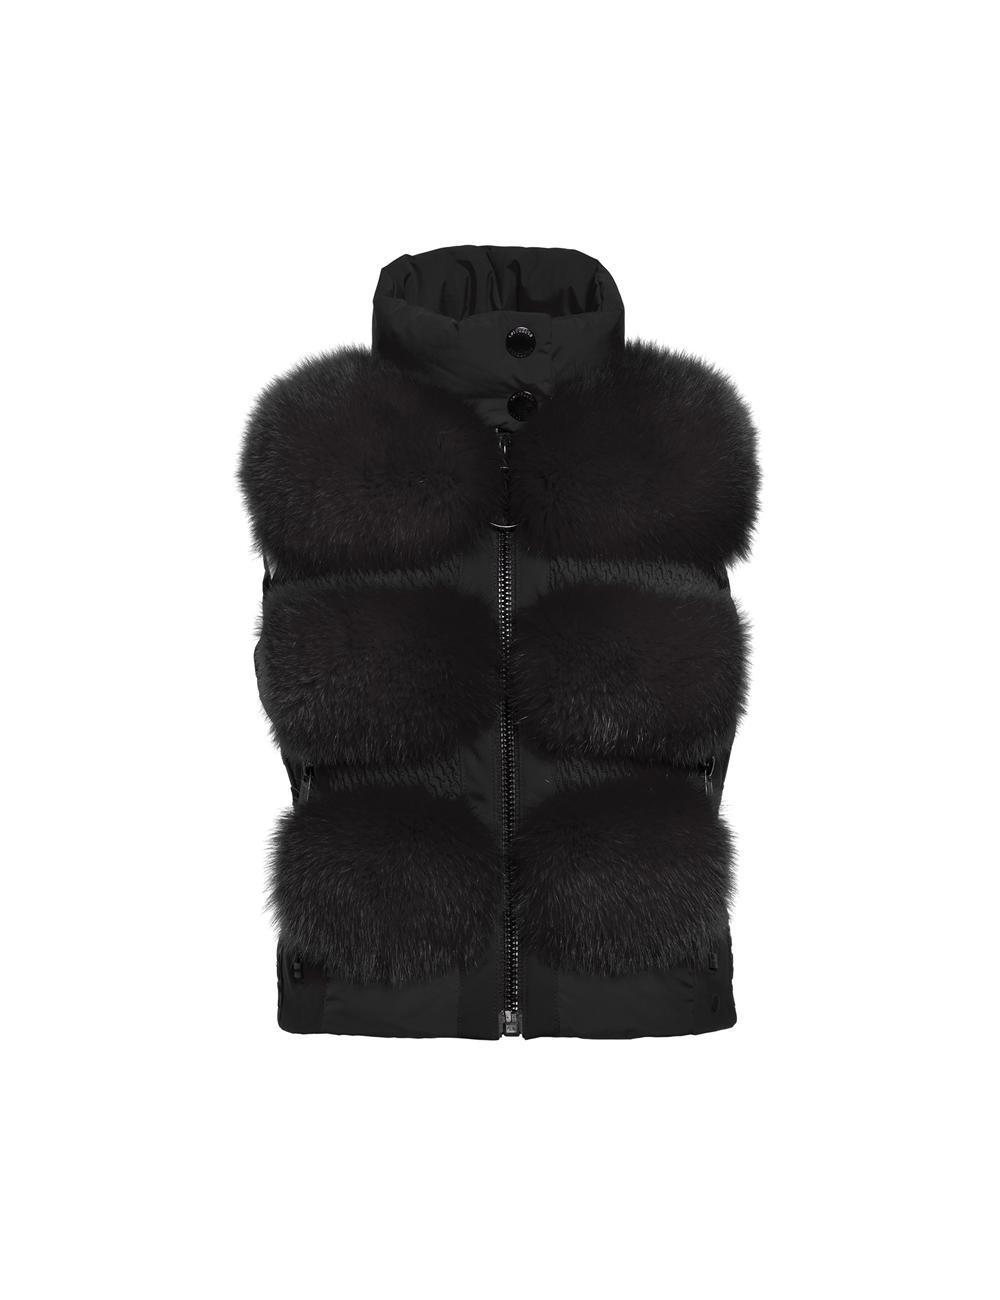 Slessless jacket Foxy Goldbergh - BIG BOSS MEGEVE